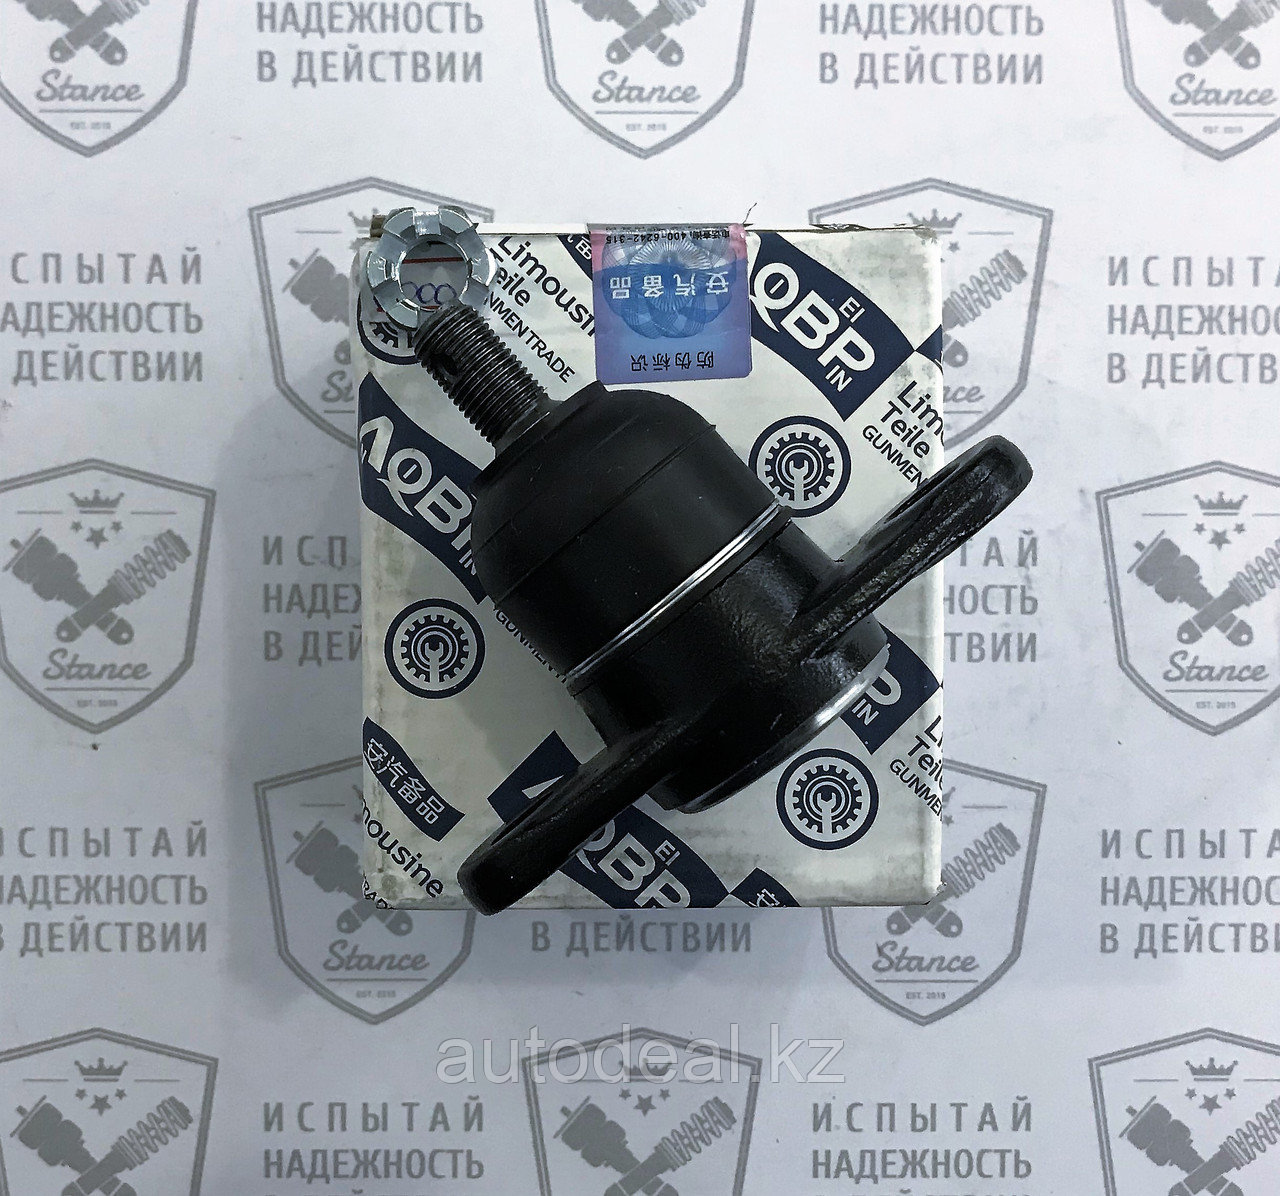 Шаровая опора JAC S3 / Ball-bearing